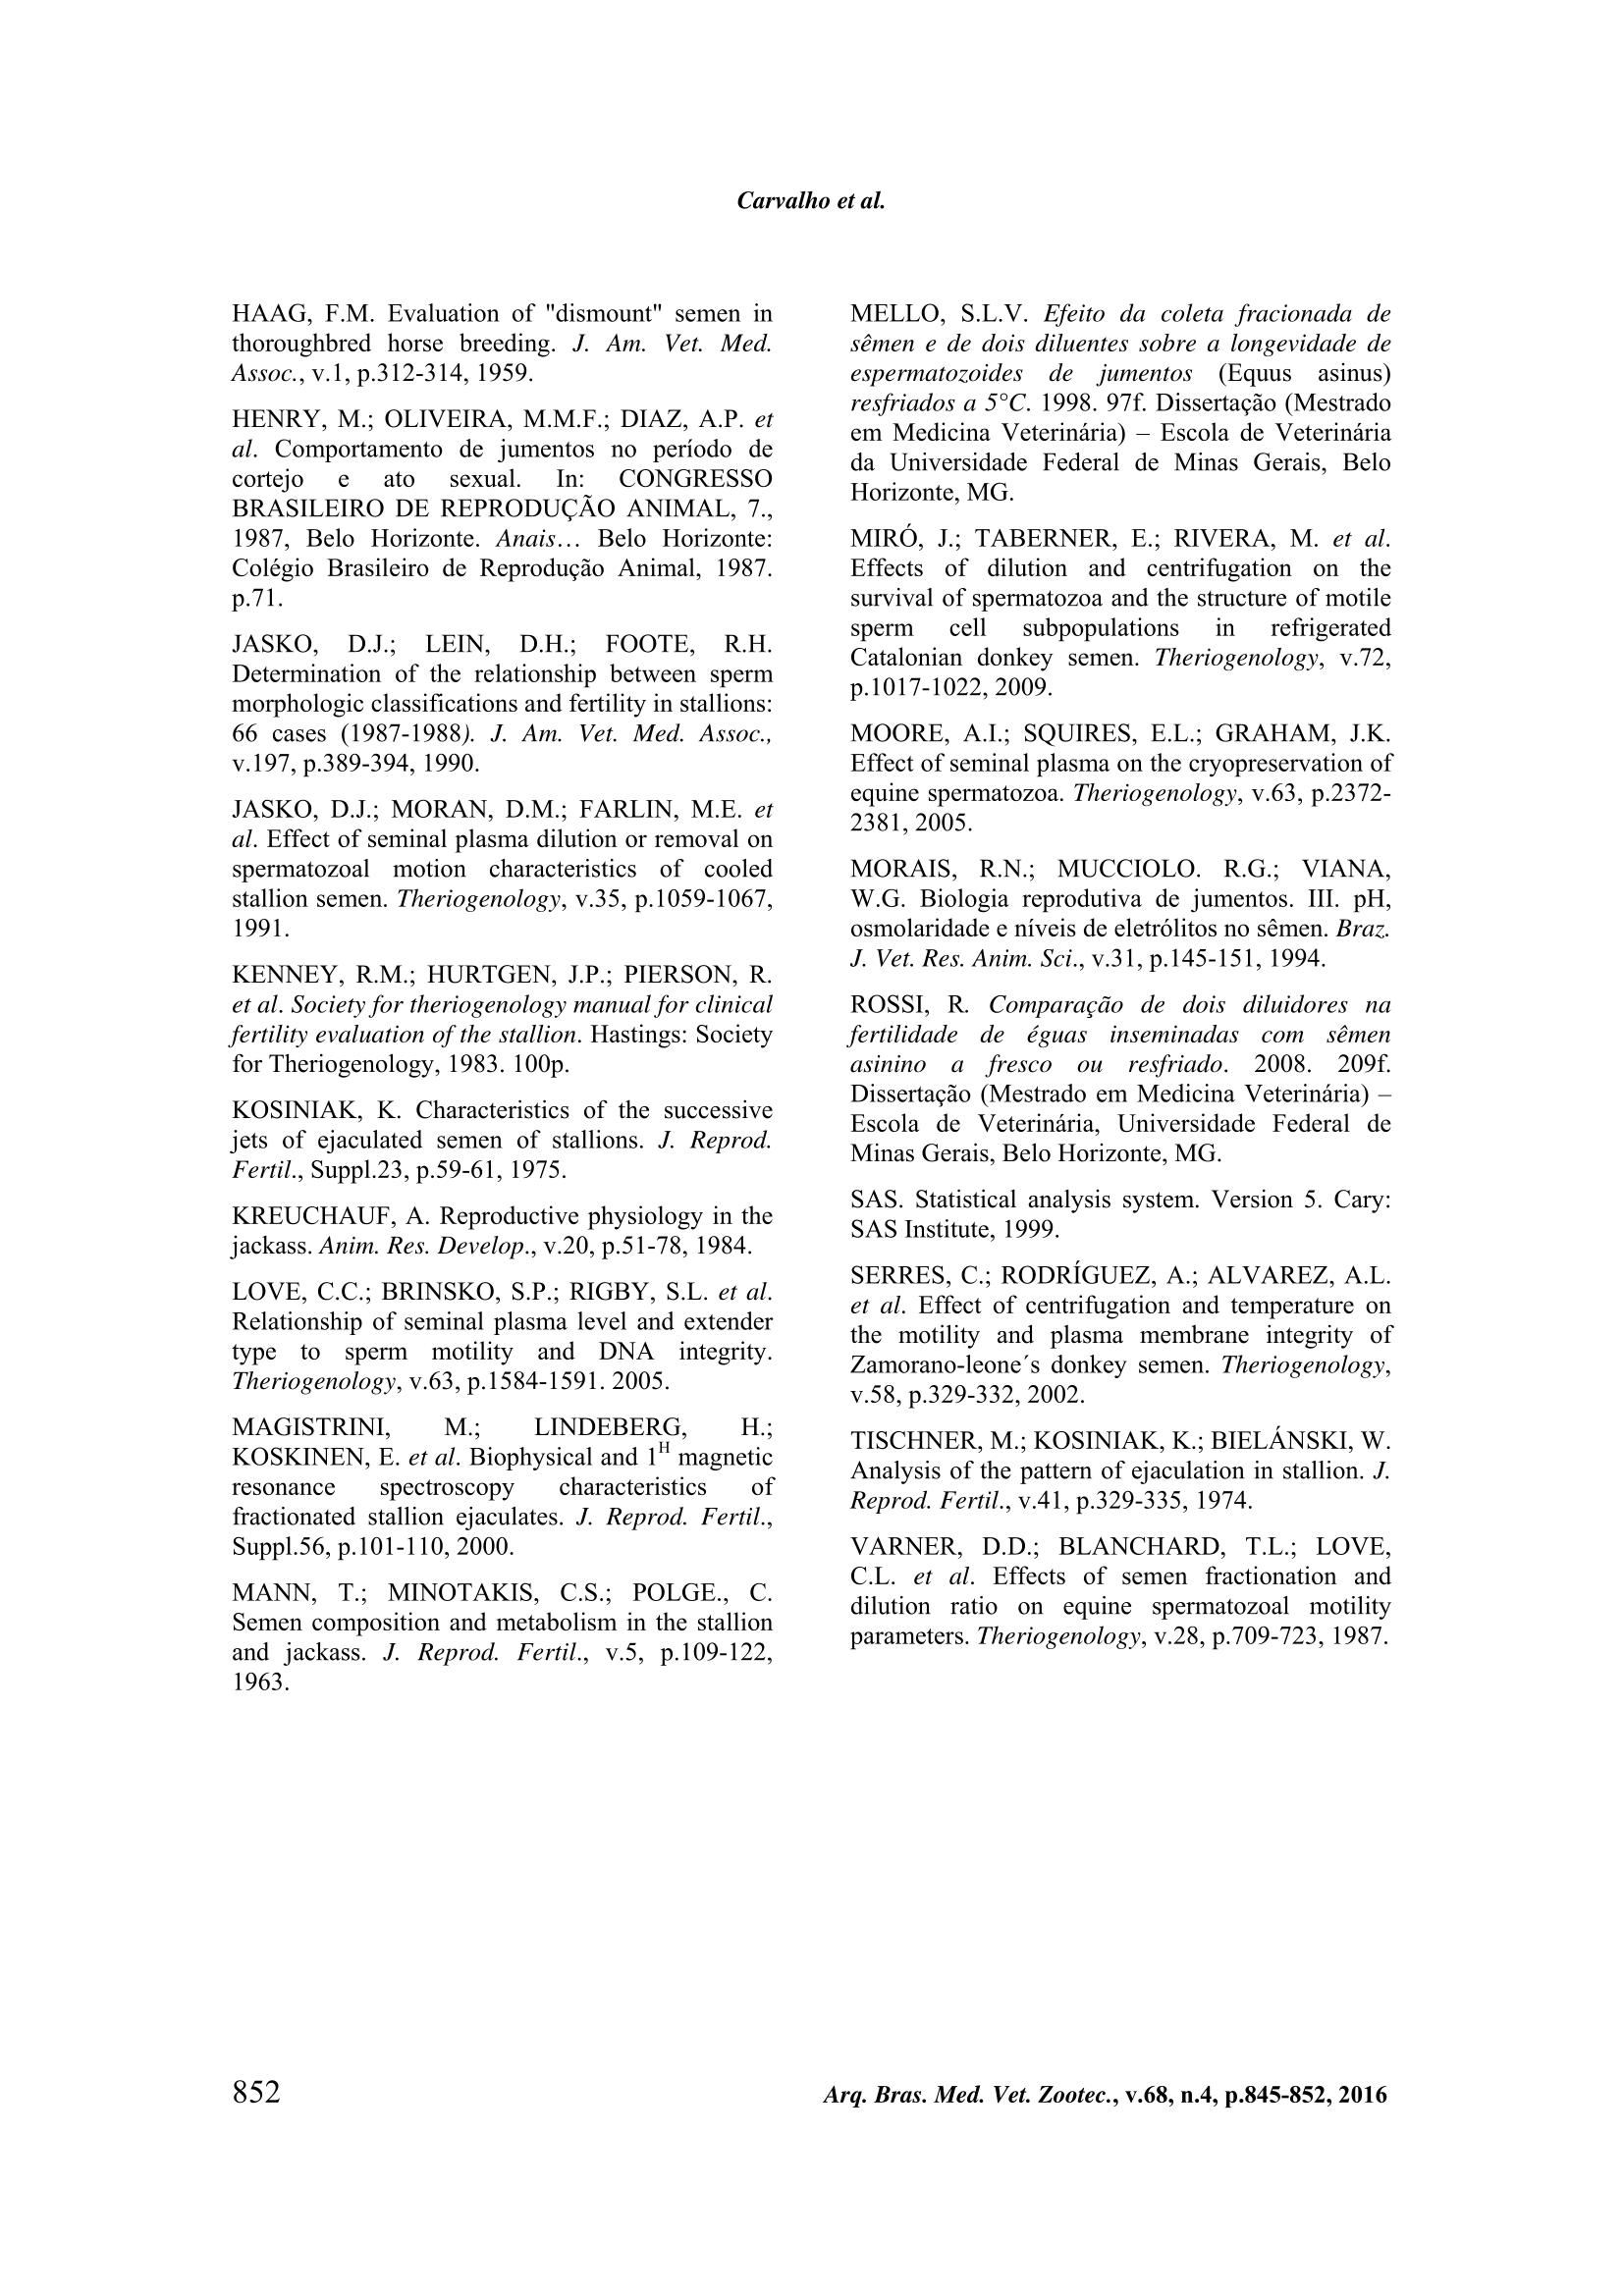 AMA 2-8 (1).png